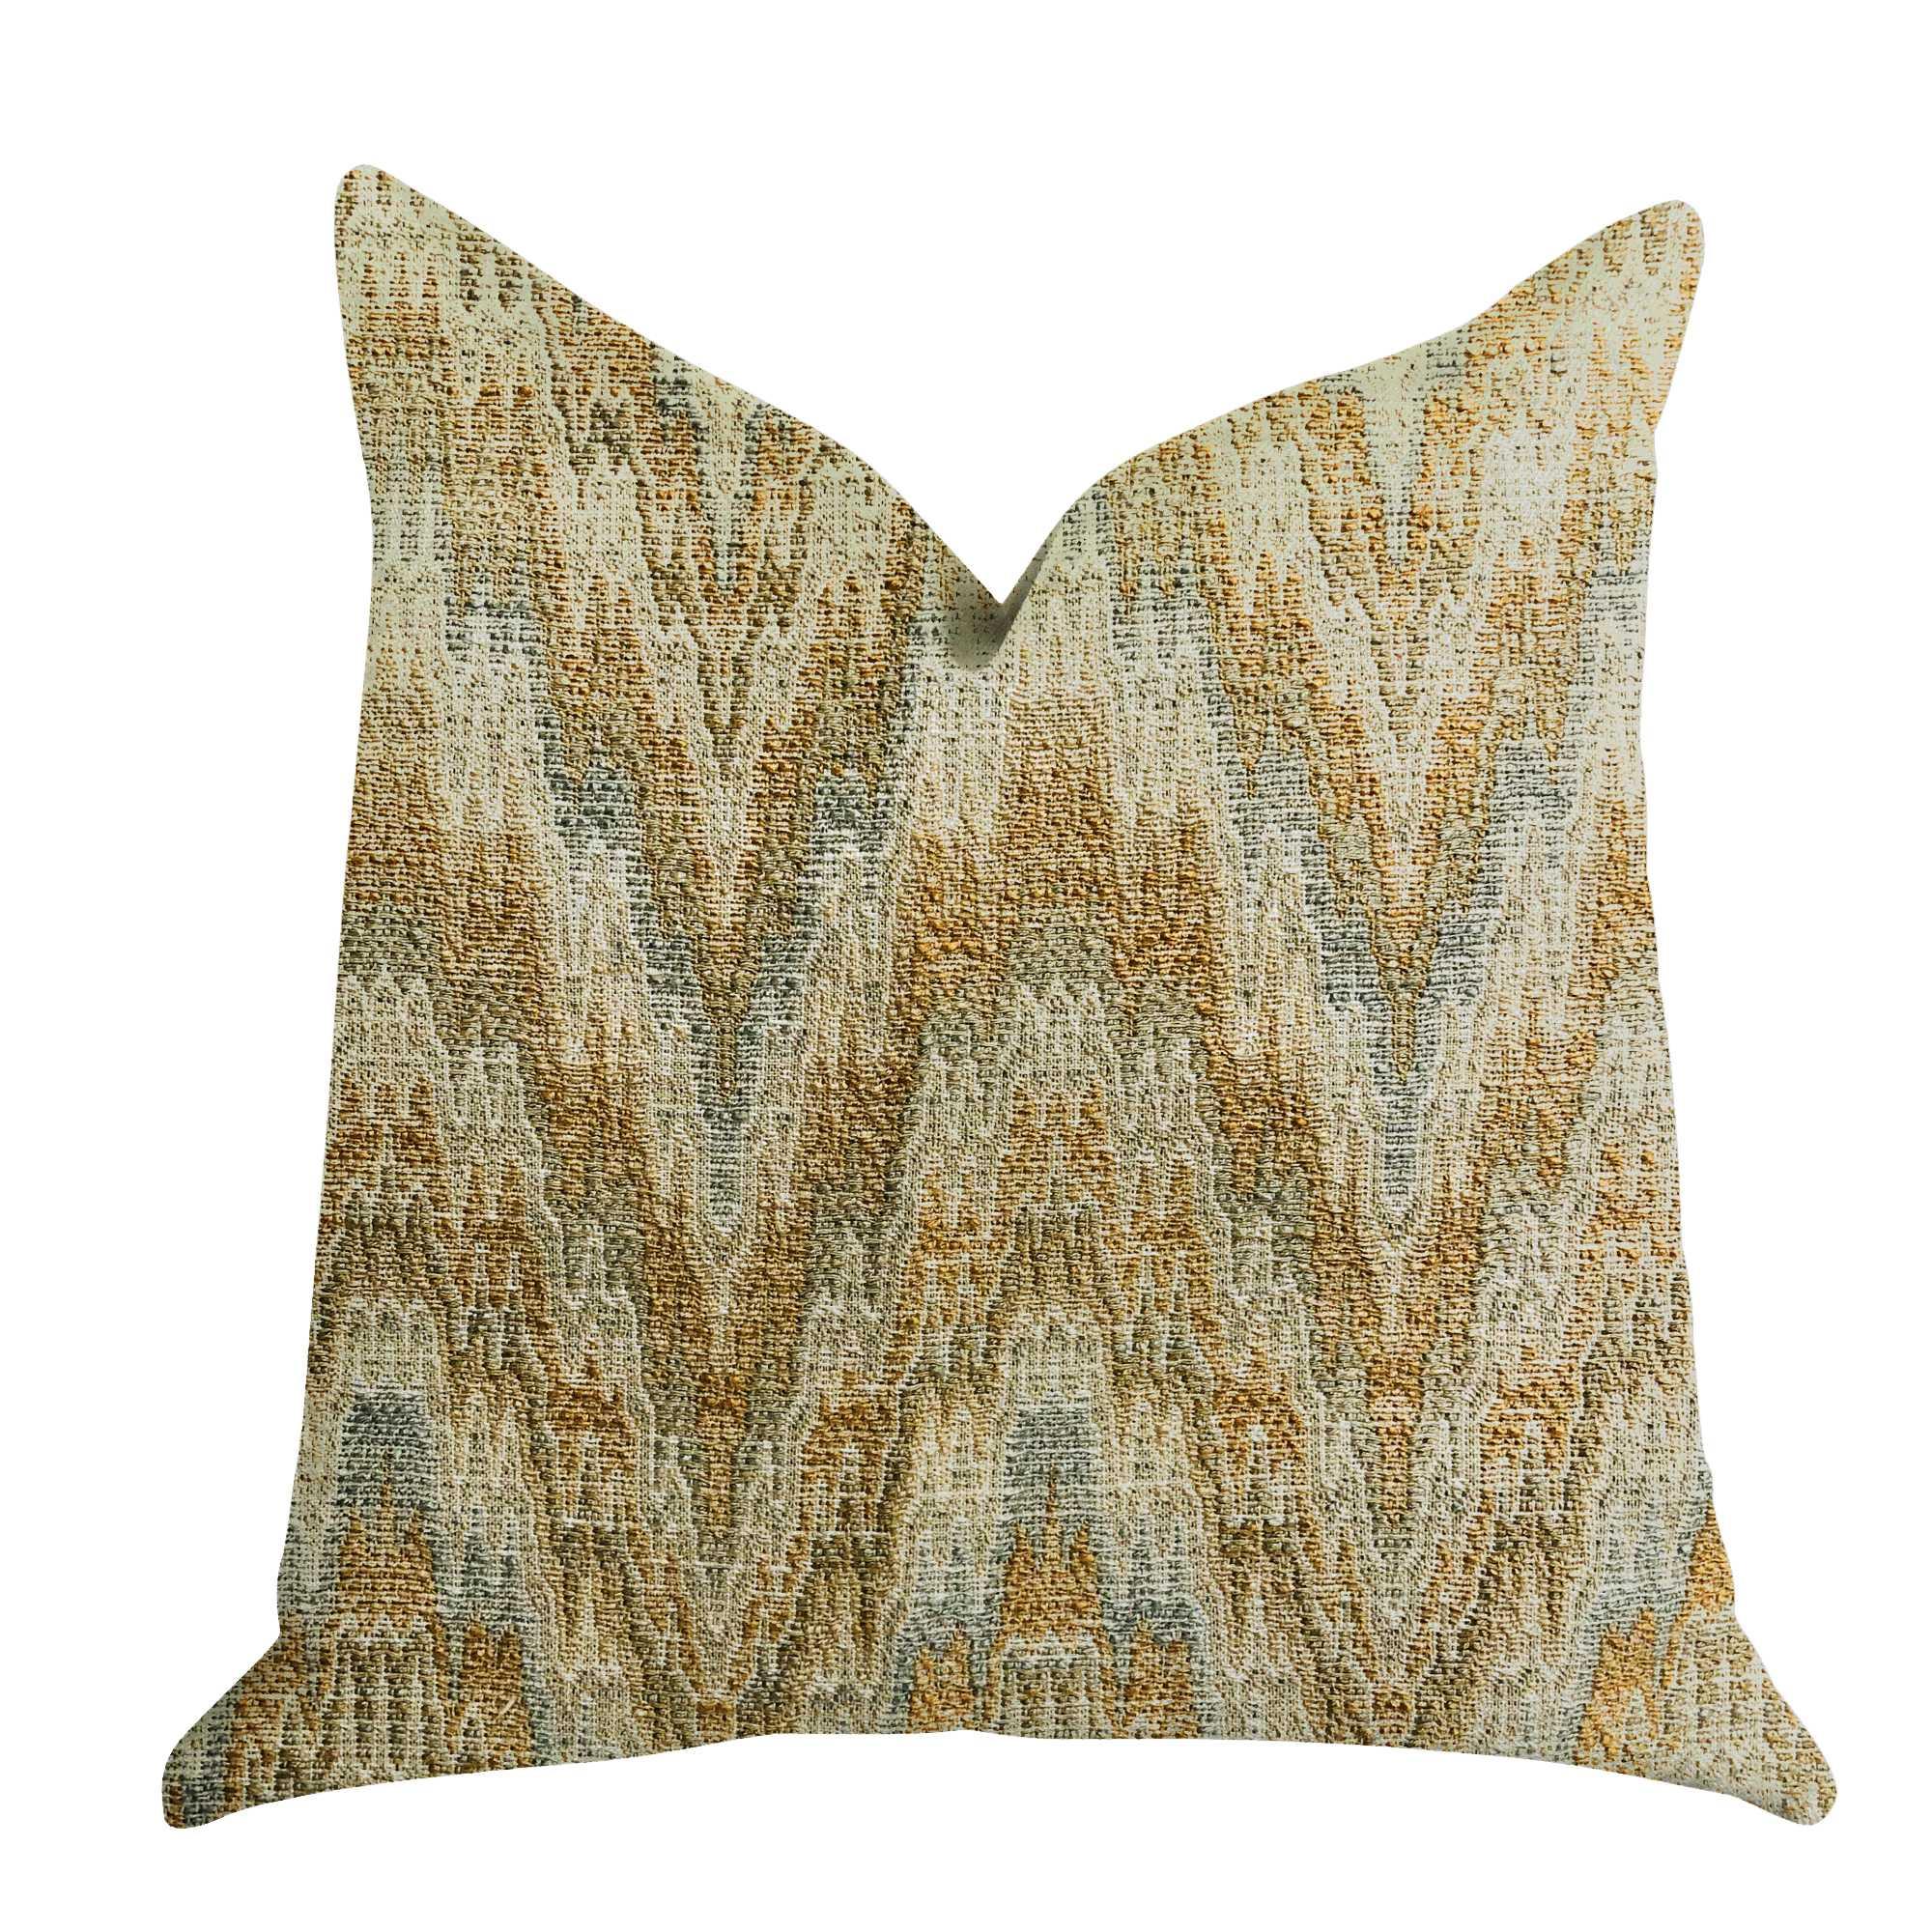 Designer Ripple Luxury Throw Pillow 20in x 30in